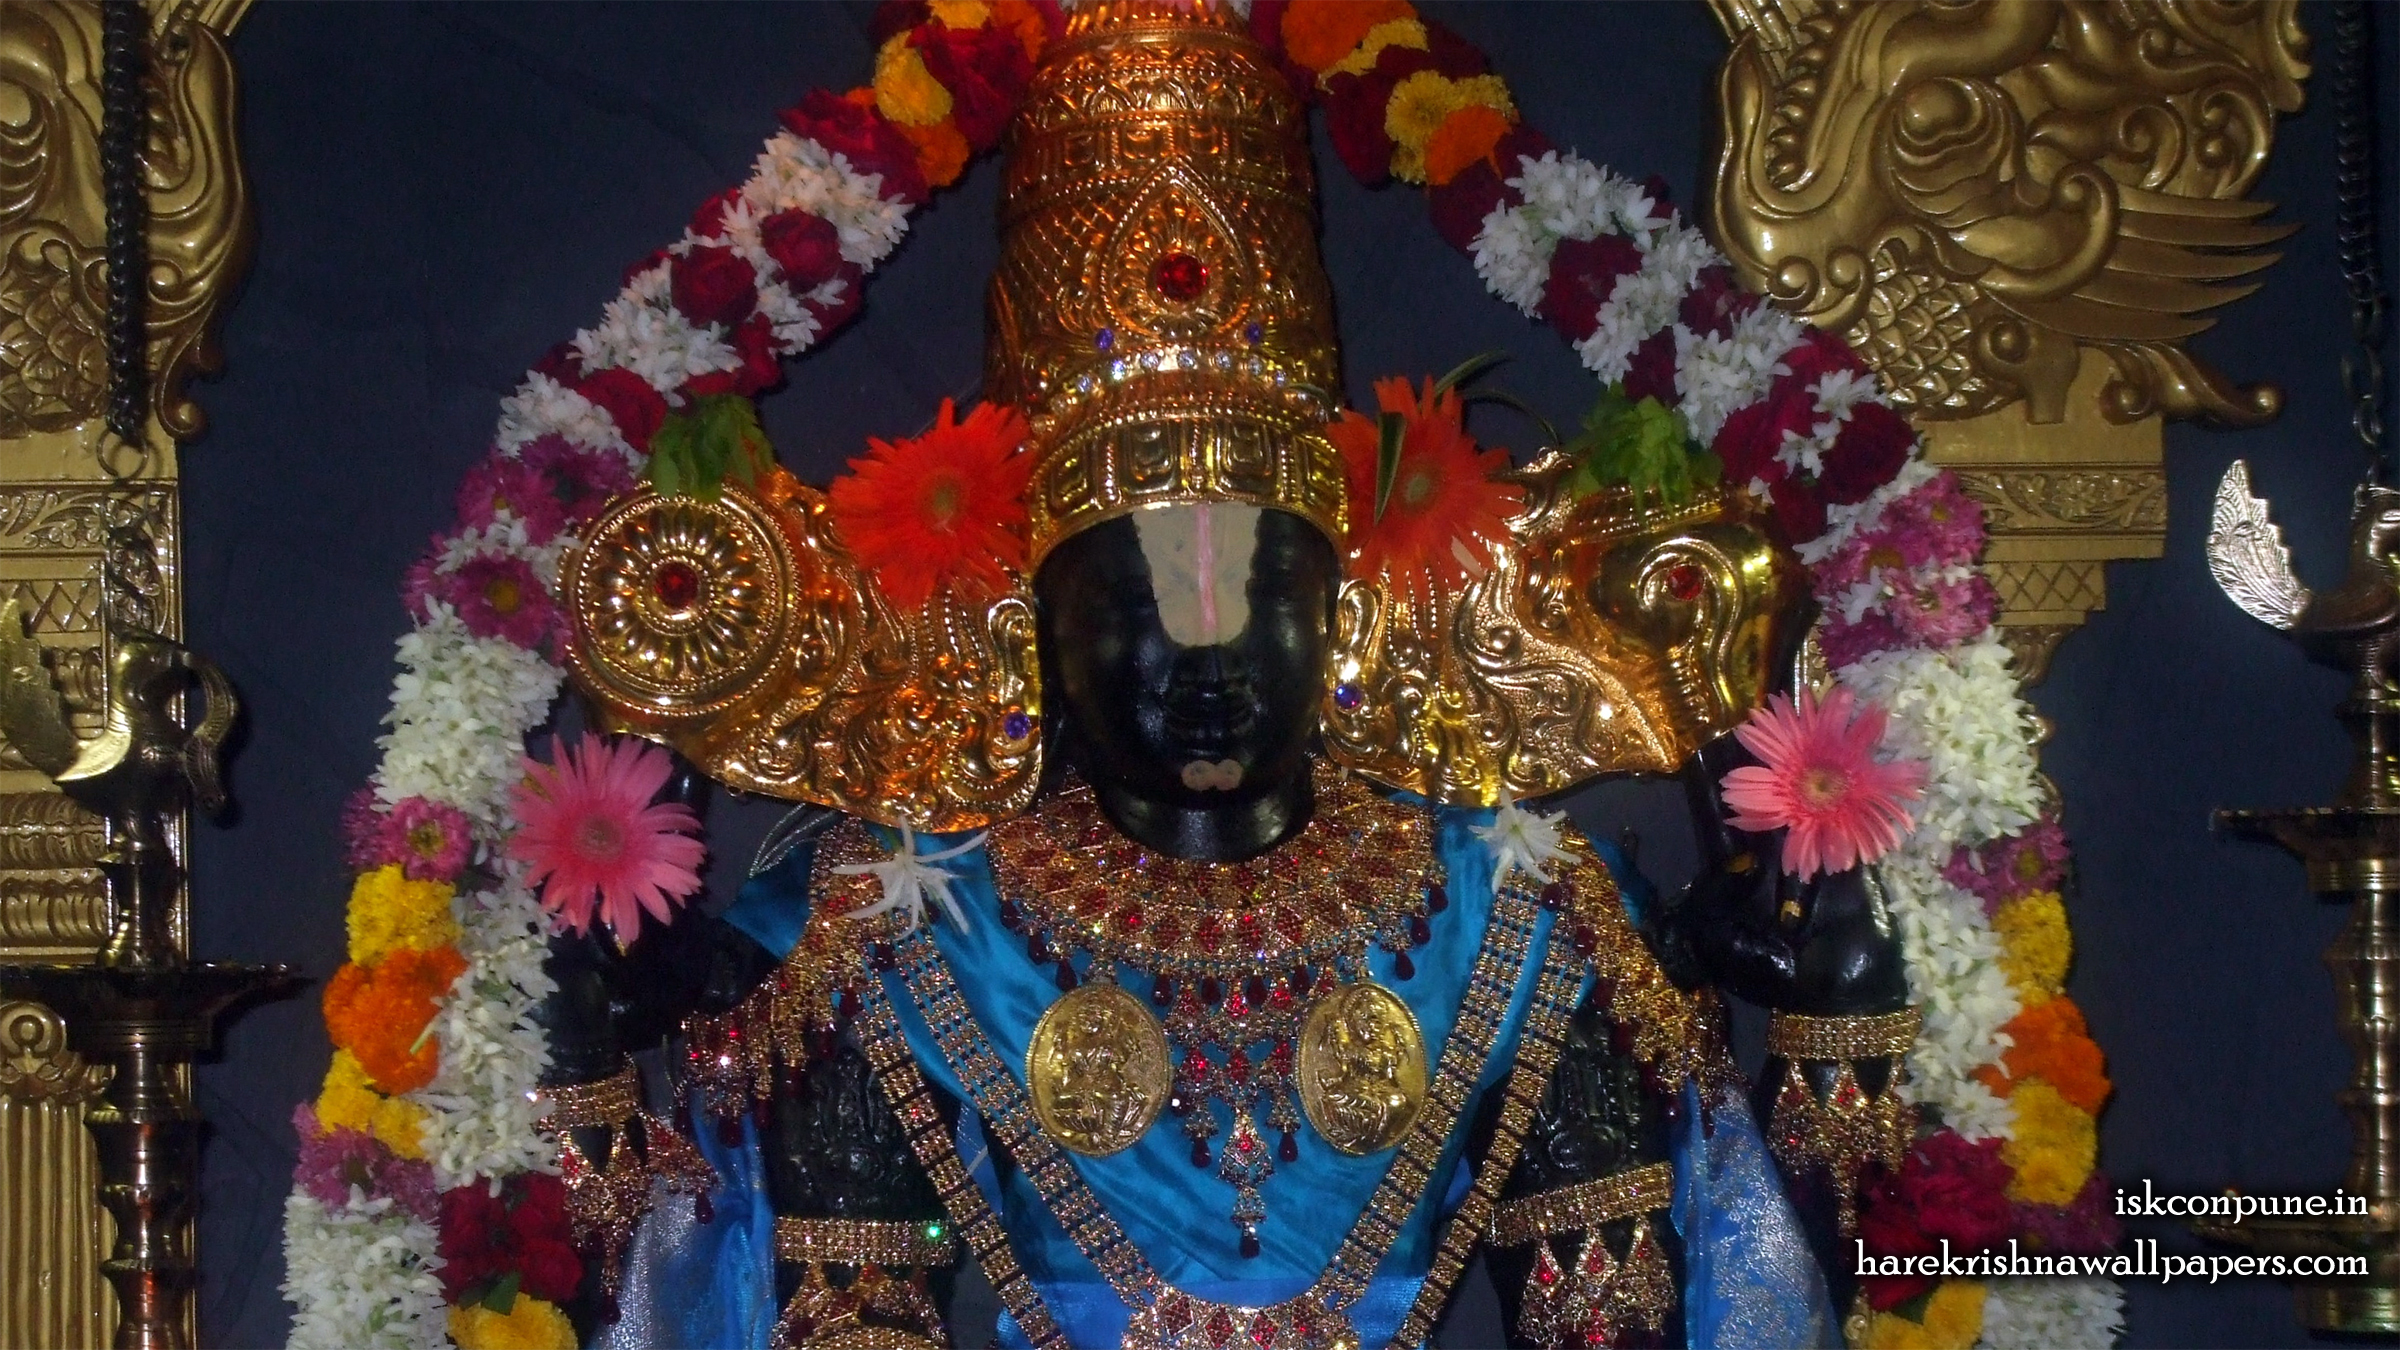 Sri Balaji Close up Wallpaper (002) Size 2400x1350 Download